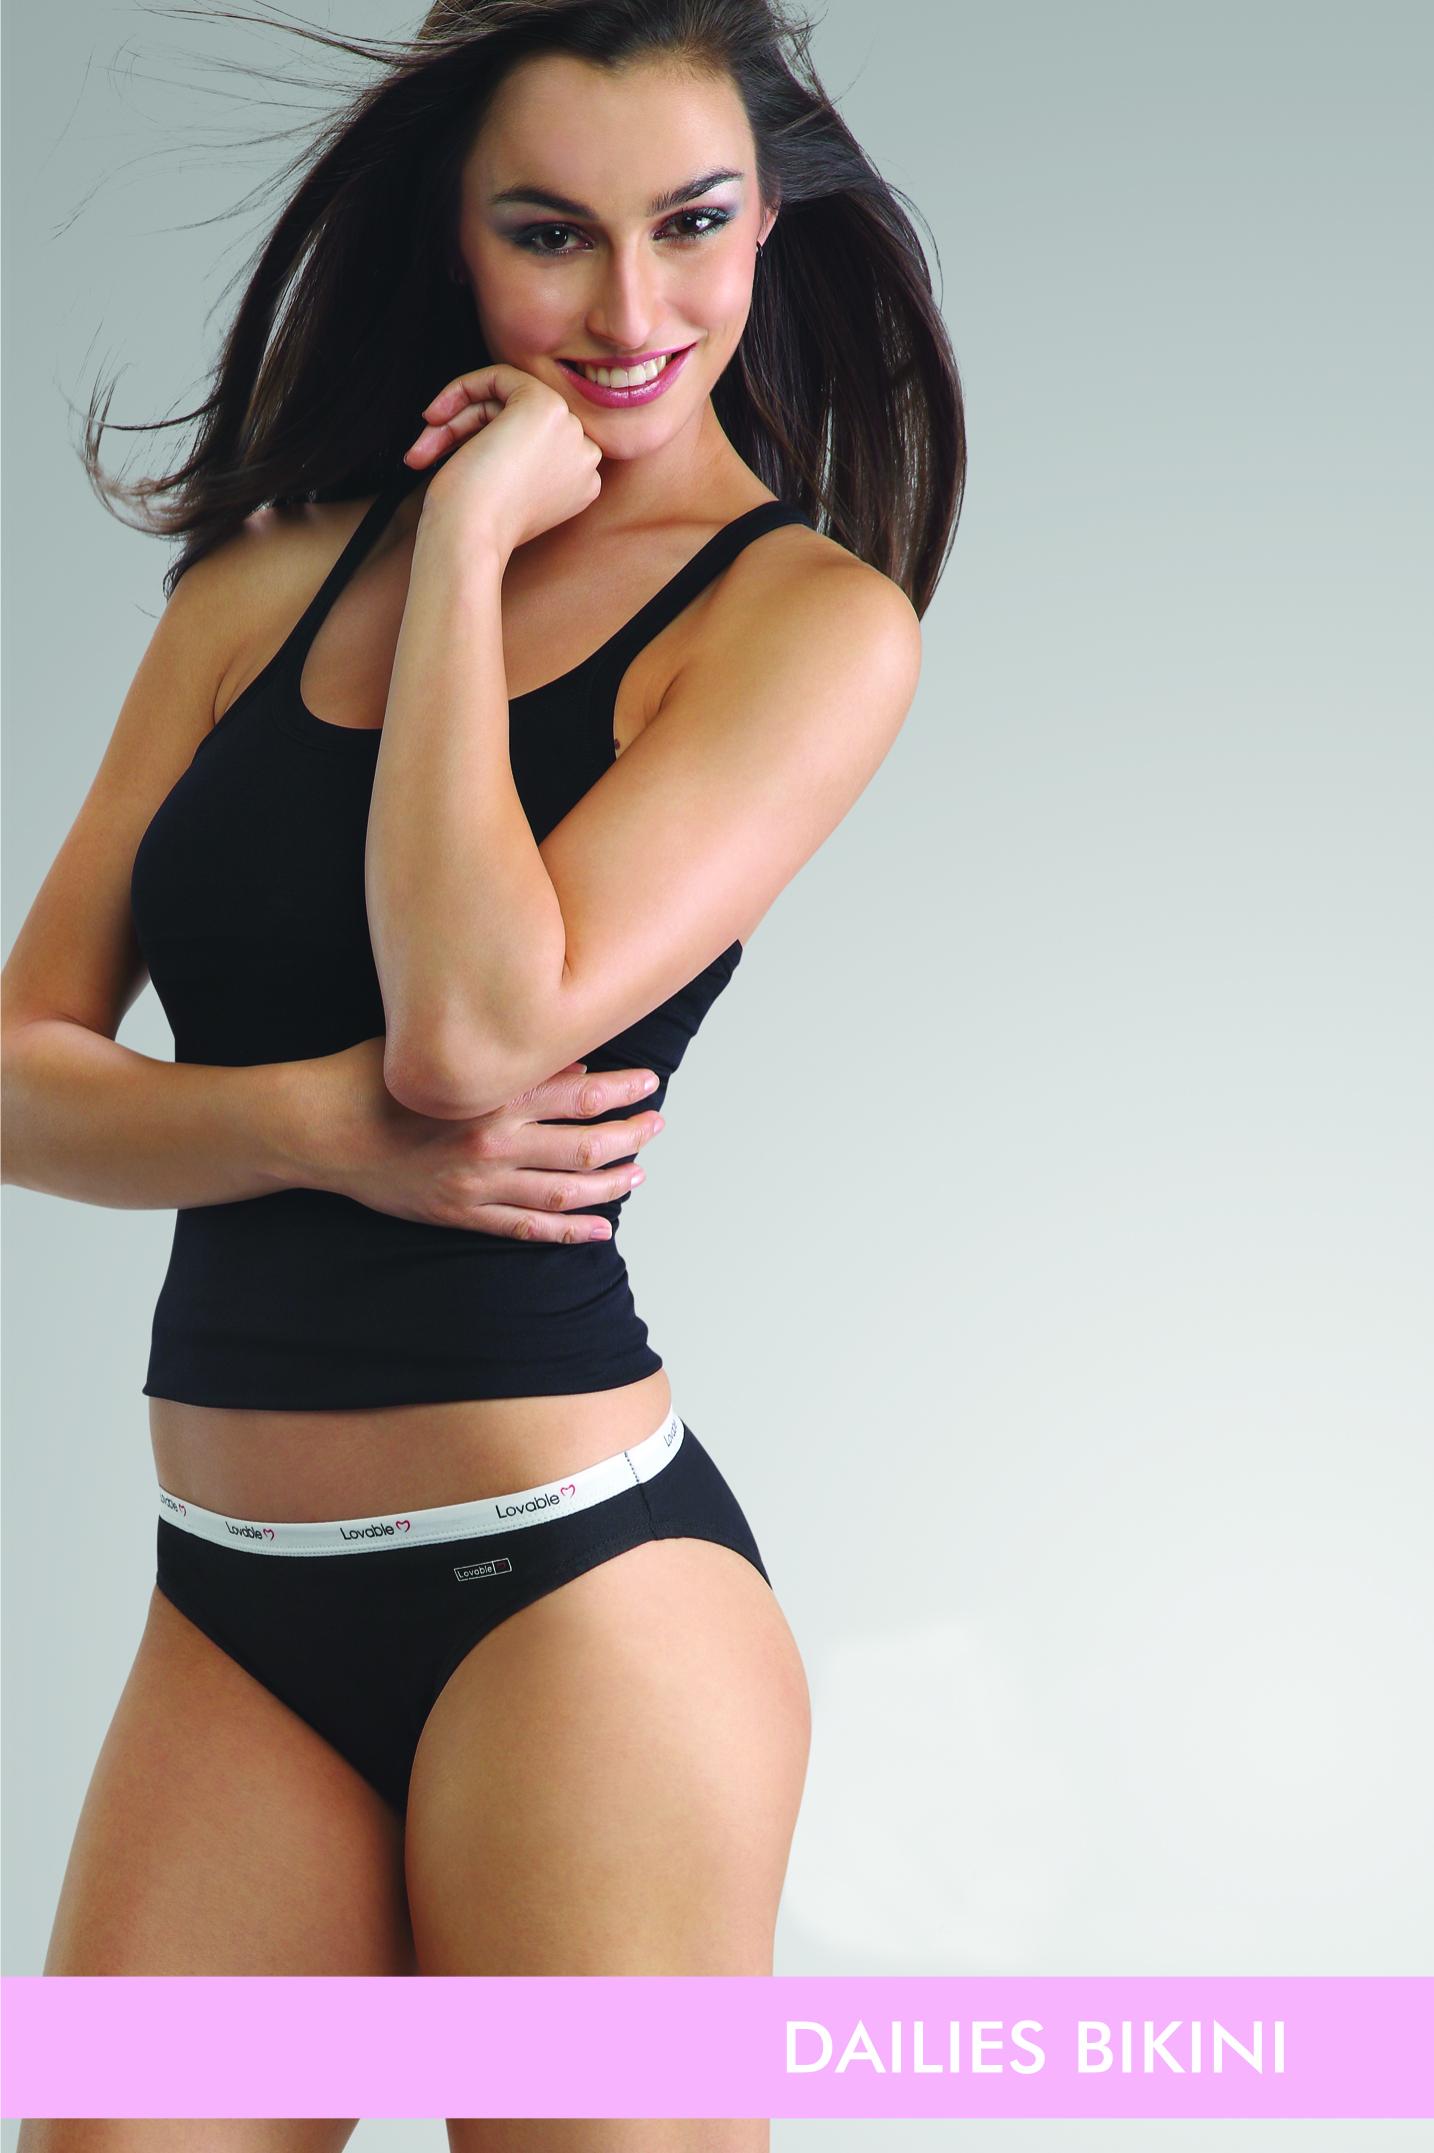 A Modal Weaing Black Slip and Black Panties of MRP Dailies Bikini